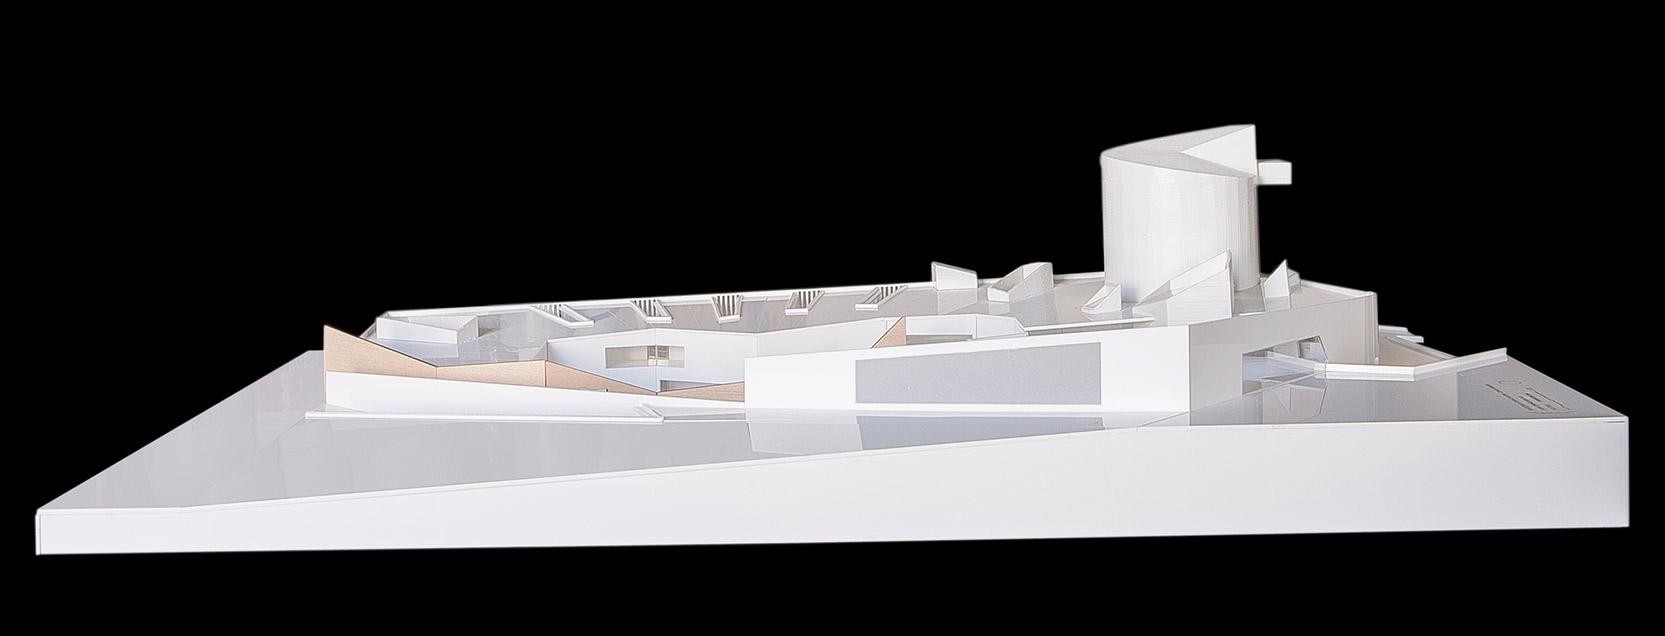 maqueta-arquitectura-valencia-museo-memorial-guerra-civil-arquiayuda (3)